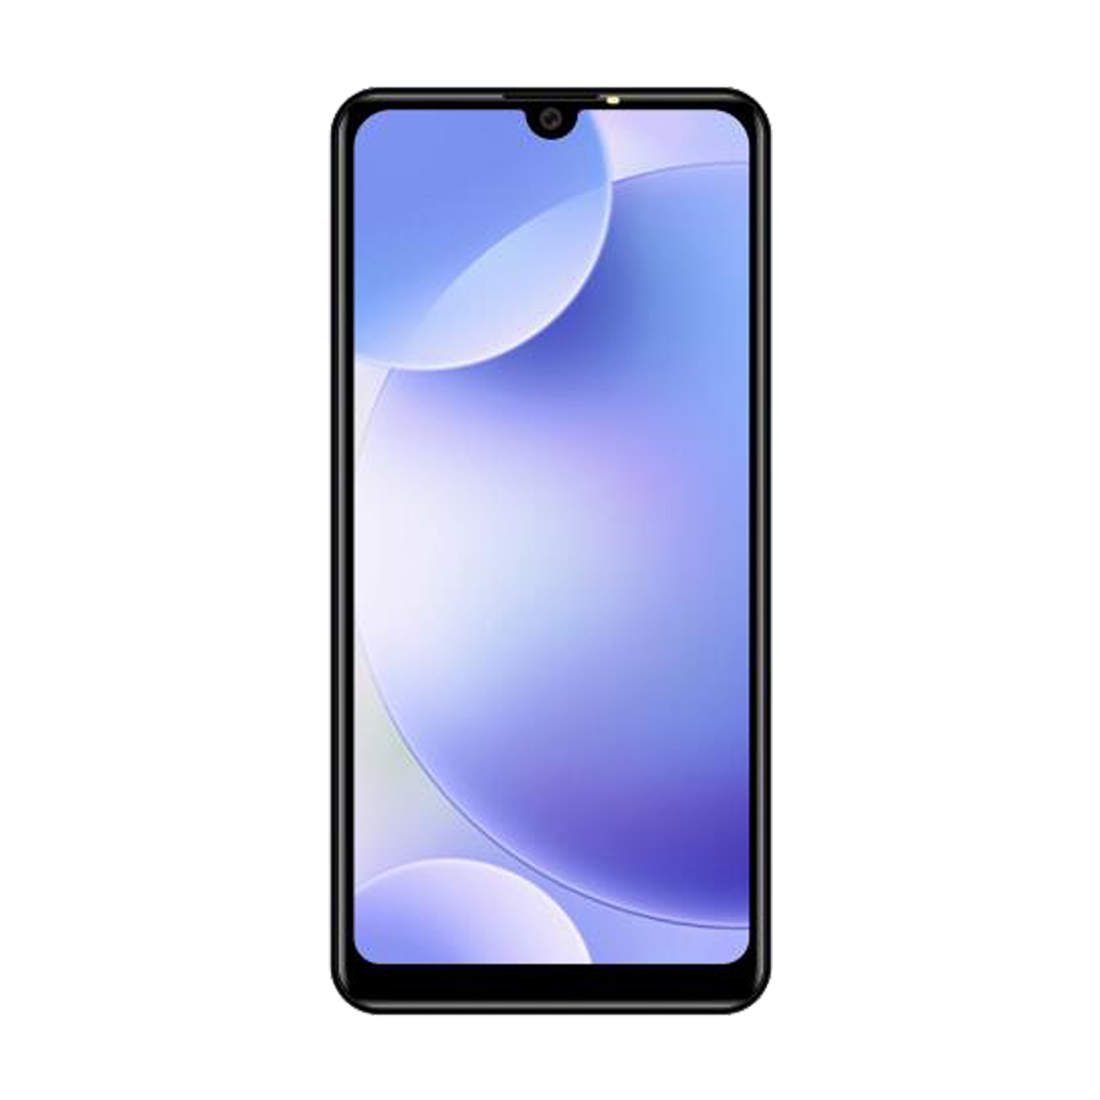 I KALL K201 6.26 Inch Display 2  GB RAM 16  GB ROM Smart Phone